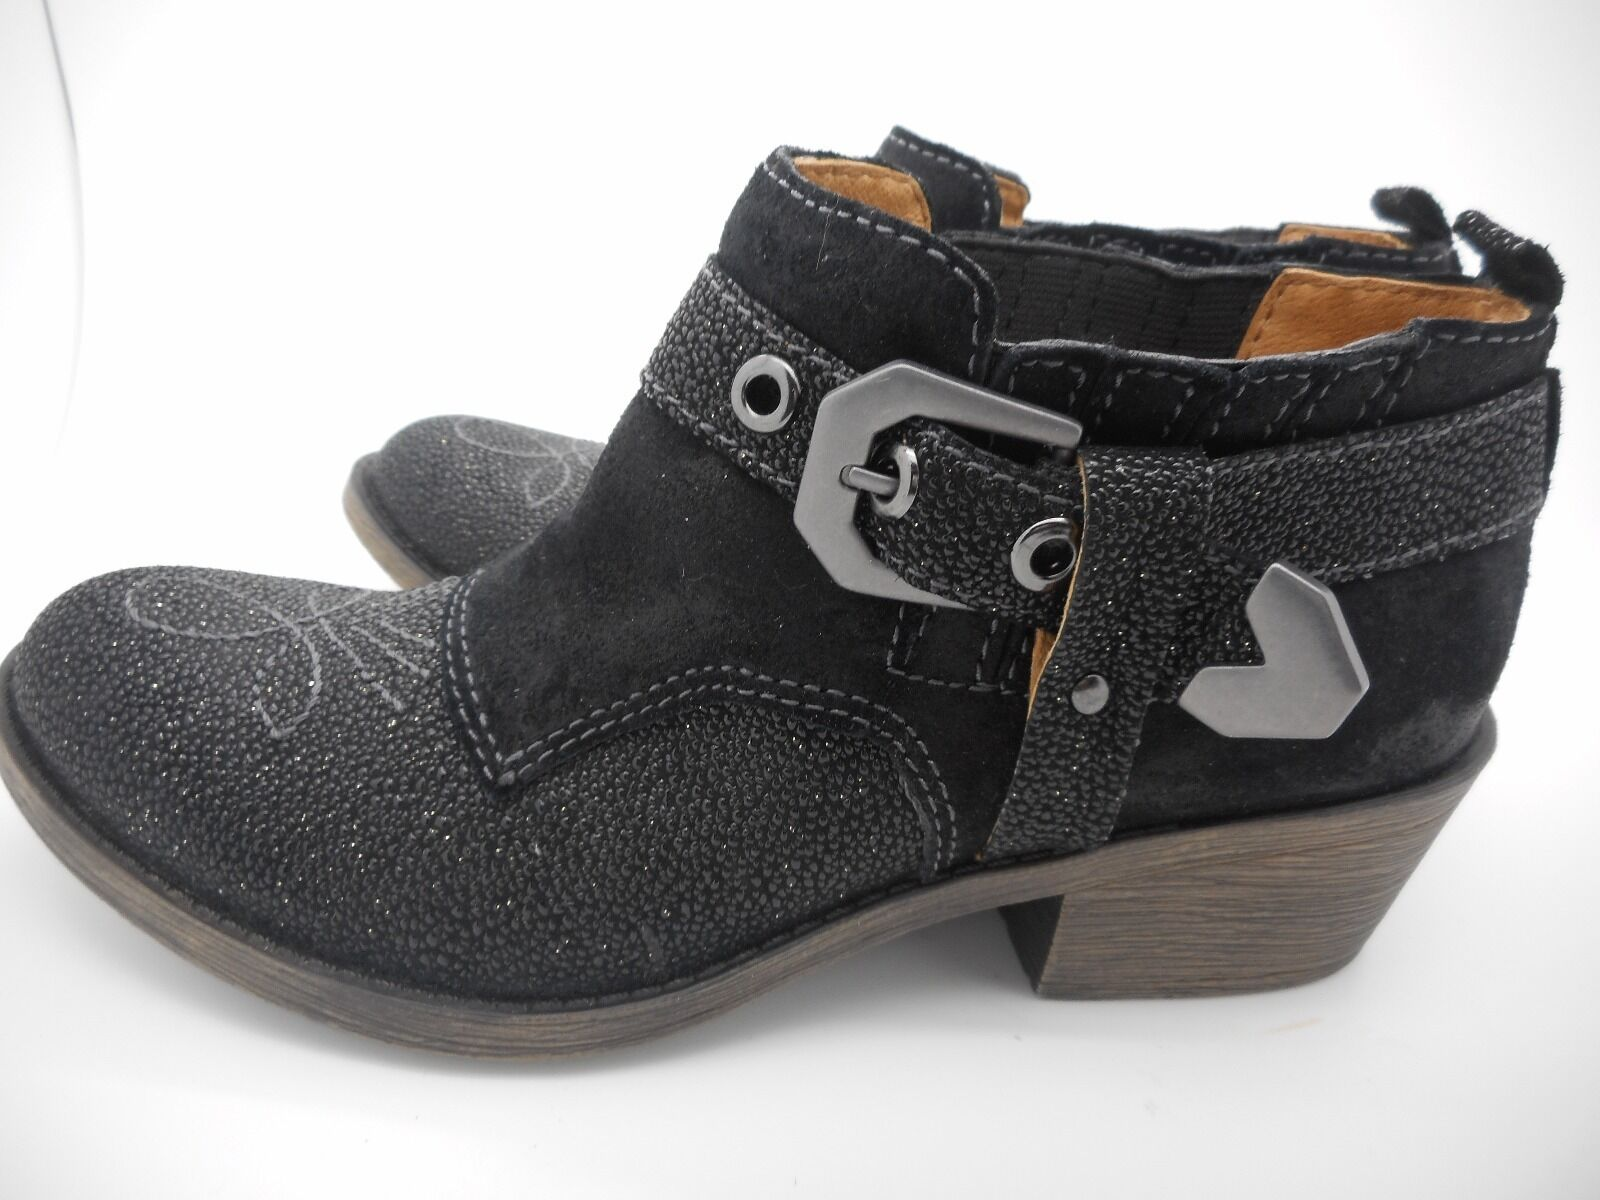 Women's Women's Women's Naya Selma Sparkling Western Black Suede Ankle Boots Size 5.5 M cfe759